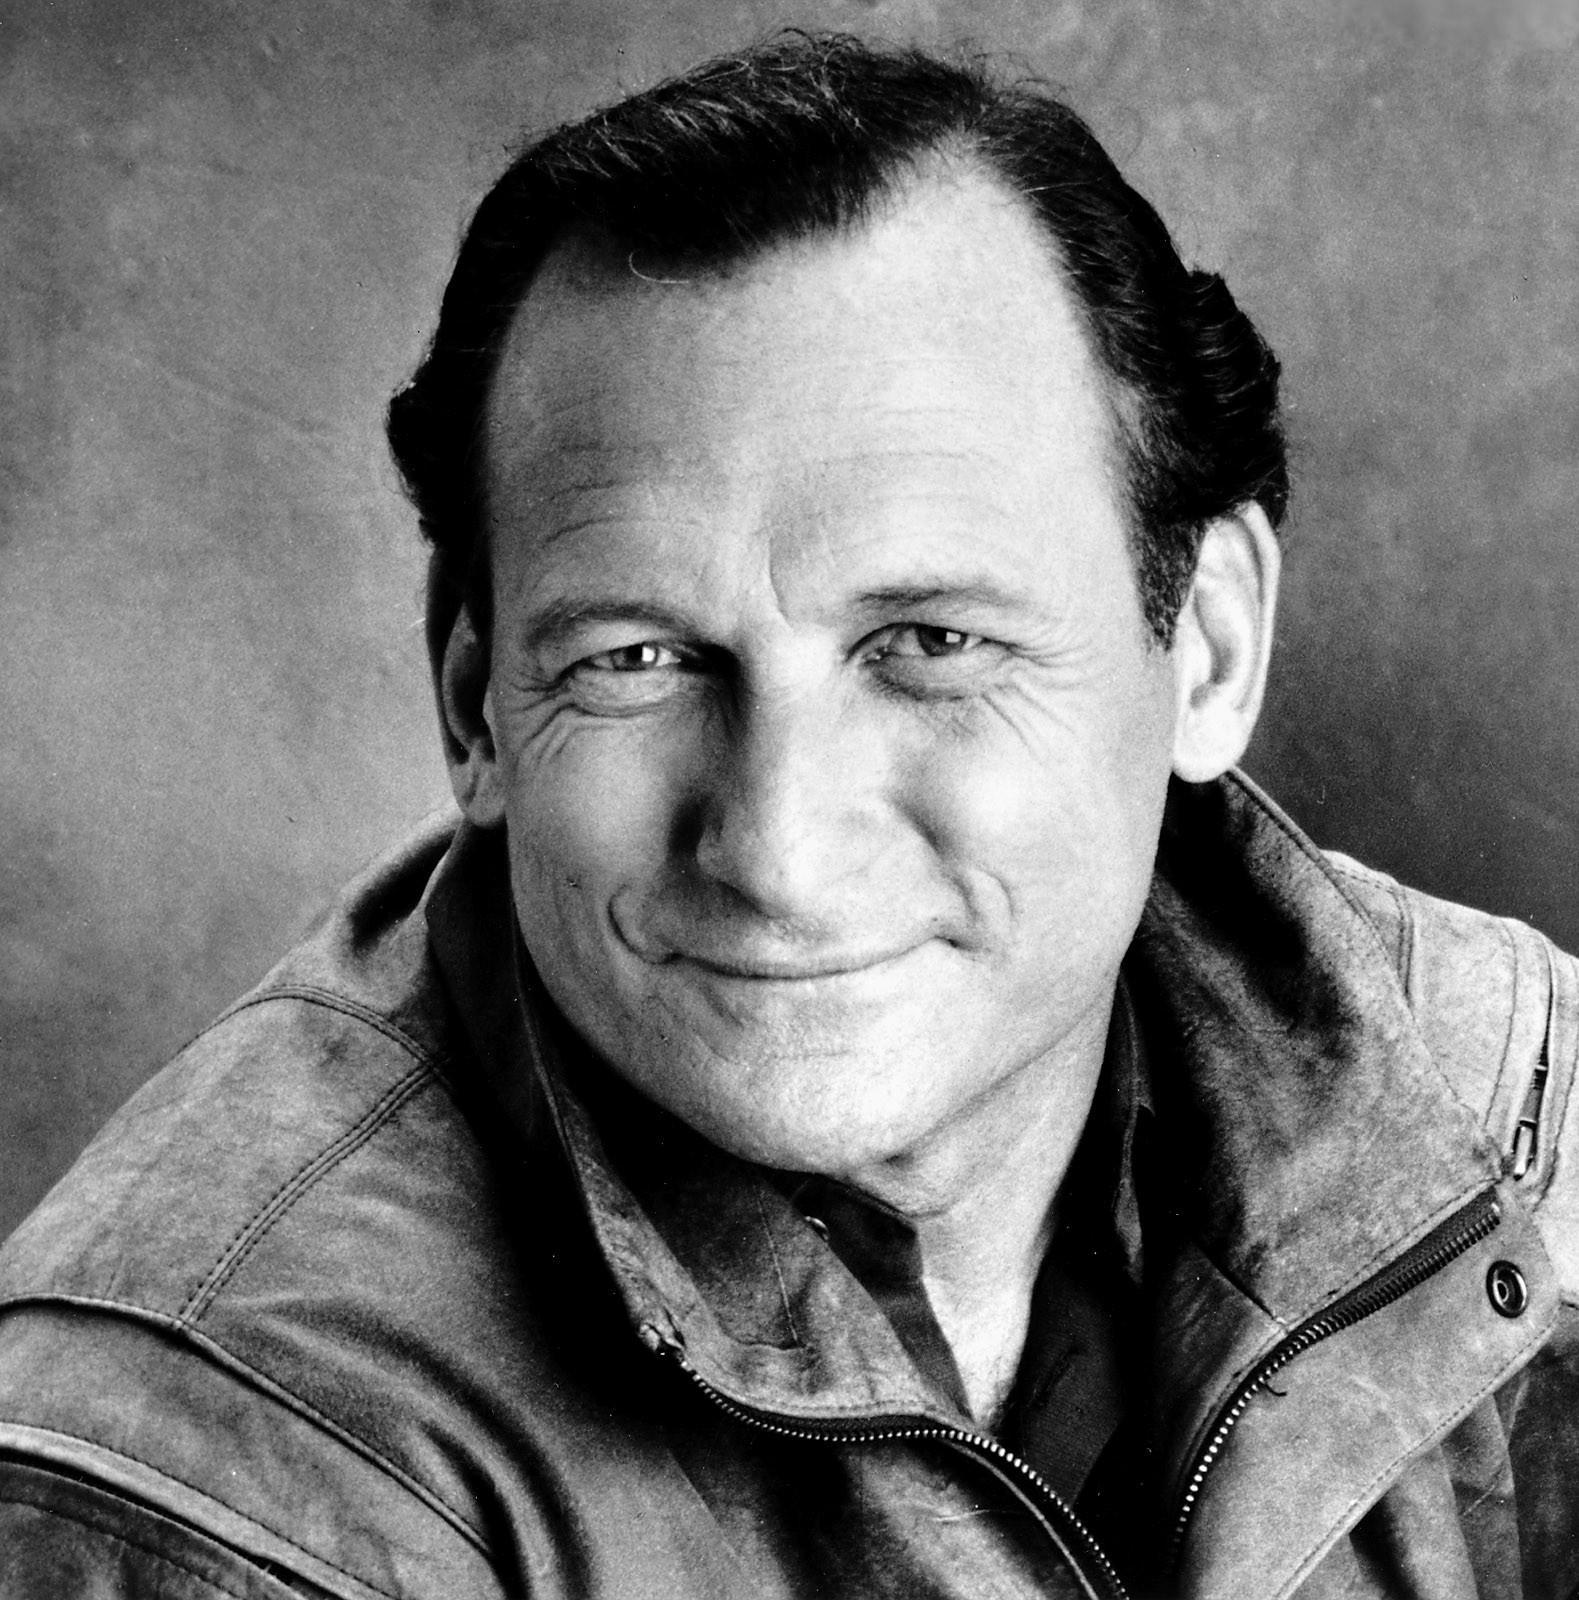 Larry Schreiner, longtime reporter for WGN dies at